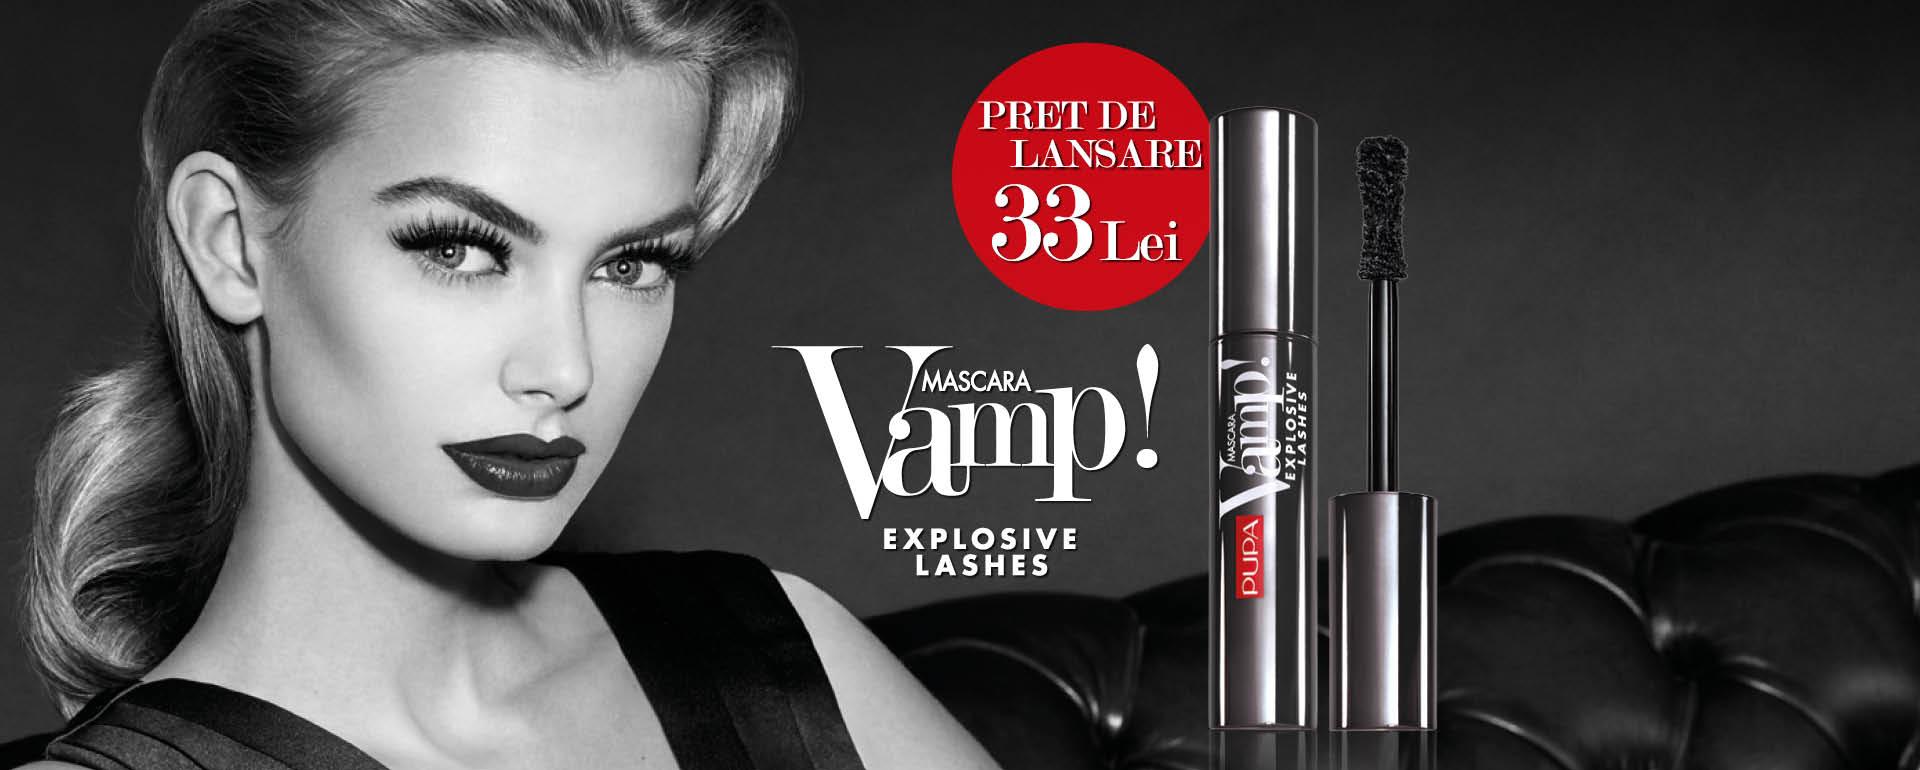 Vamp! Explosive Lashes Mascara